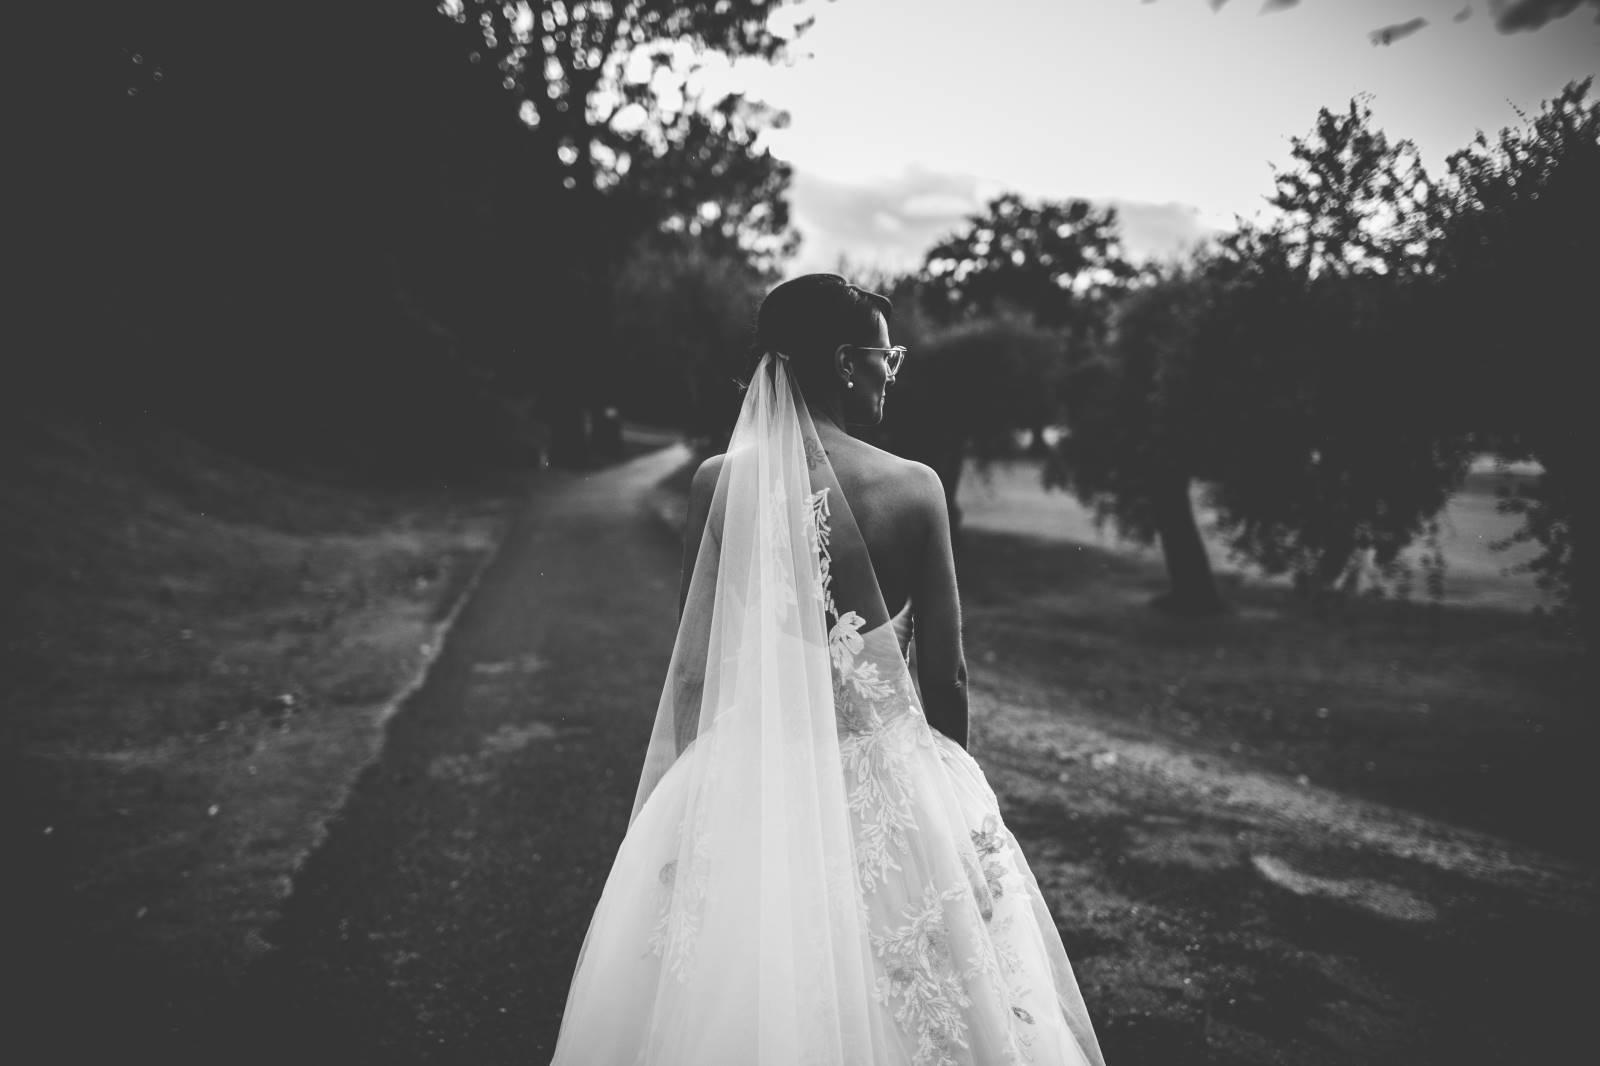 Sara_e_Alessandro_matrimonio_02090_IMG_4752